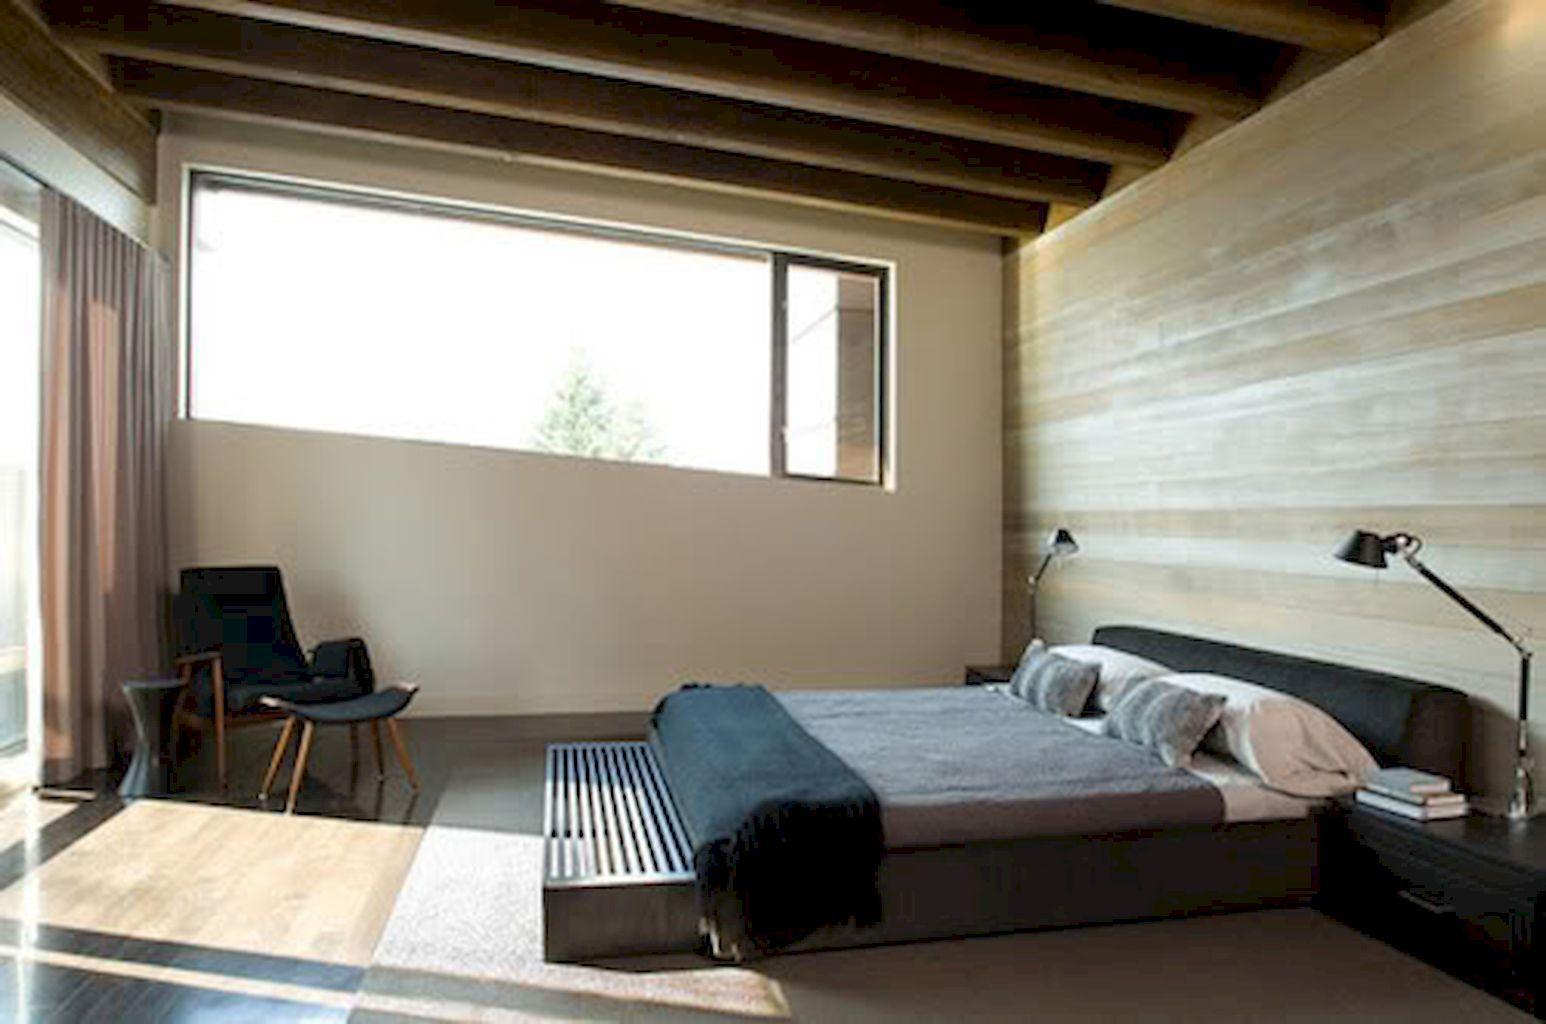 Master Bedroom Minimalist Design Brilliant 99 Minimalist Master Bedroom Ideas That Blend Aesthetics With 2018